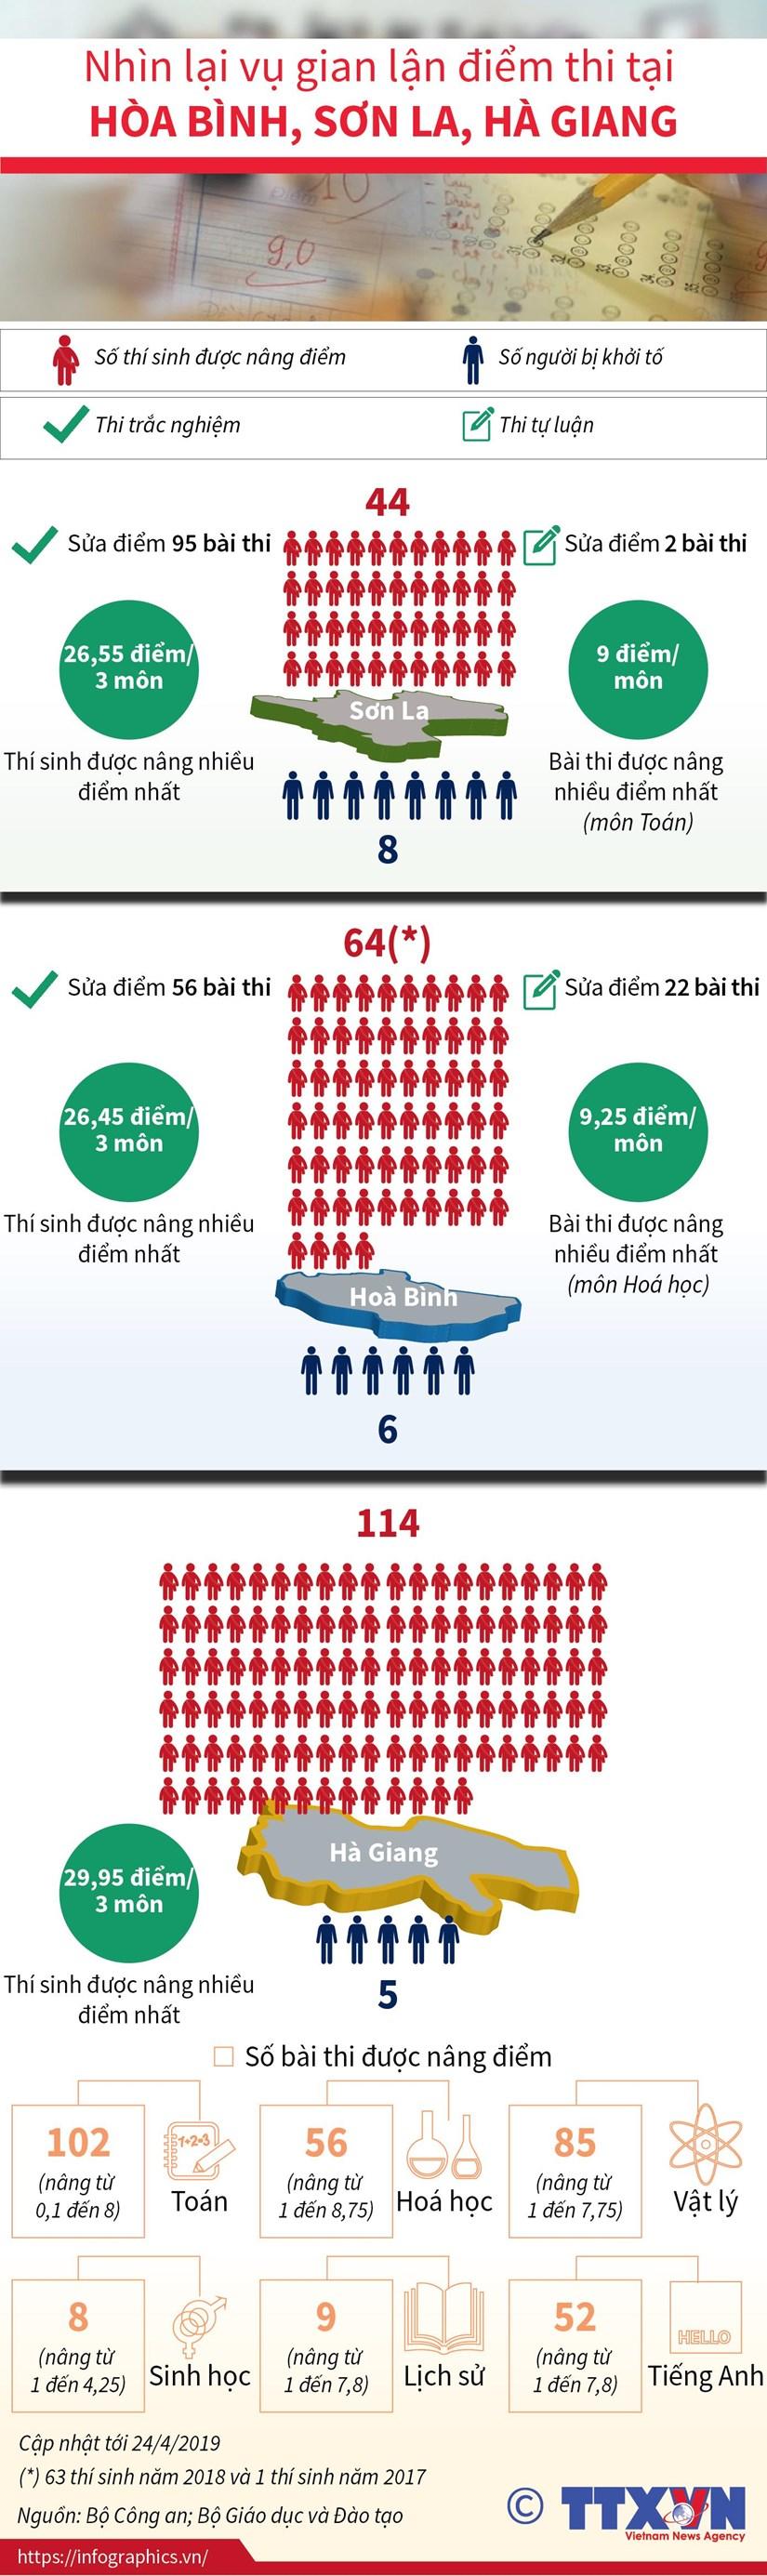 [Infographics] Vu gian lan diem thi tai Hoa Binh, Son La, Ha Giang hinh anh 1